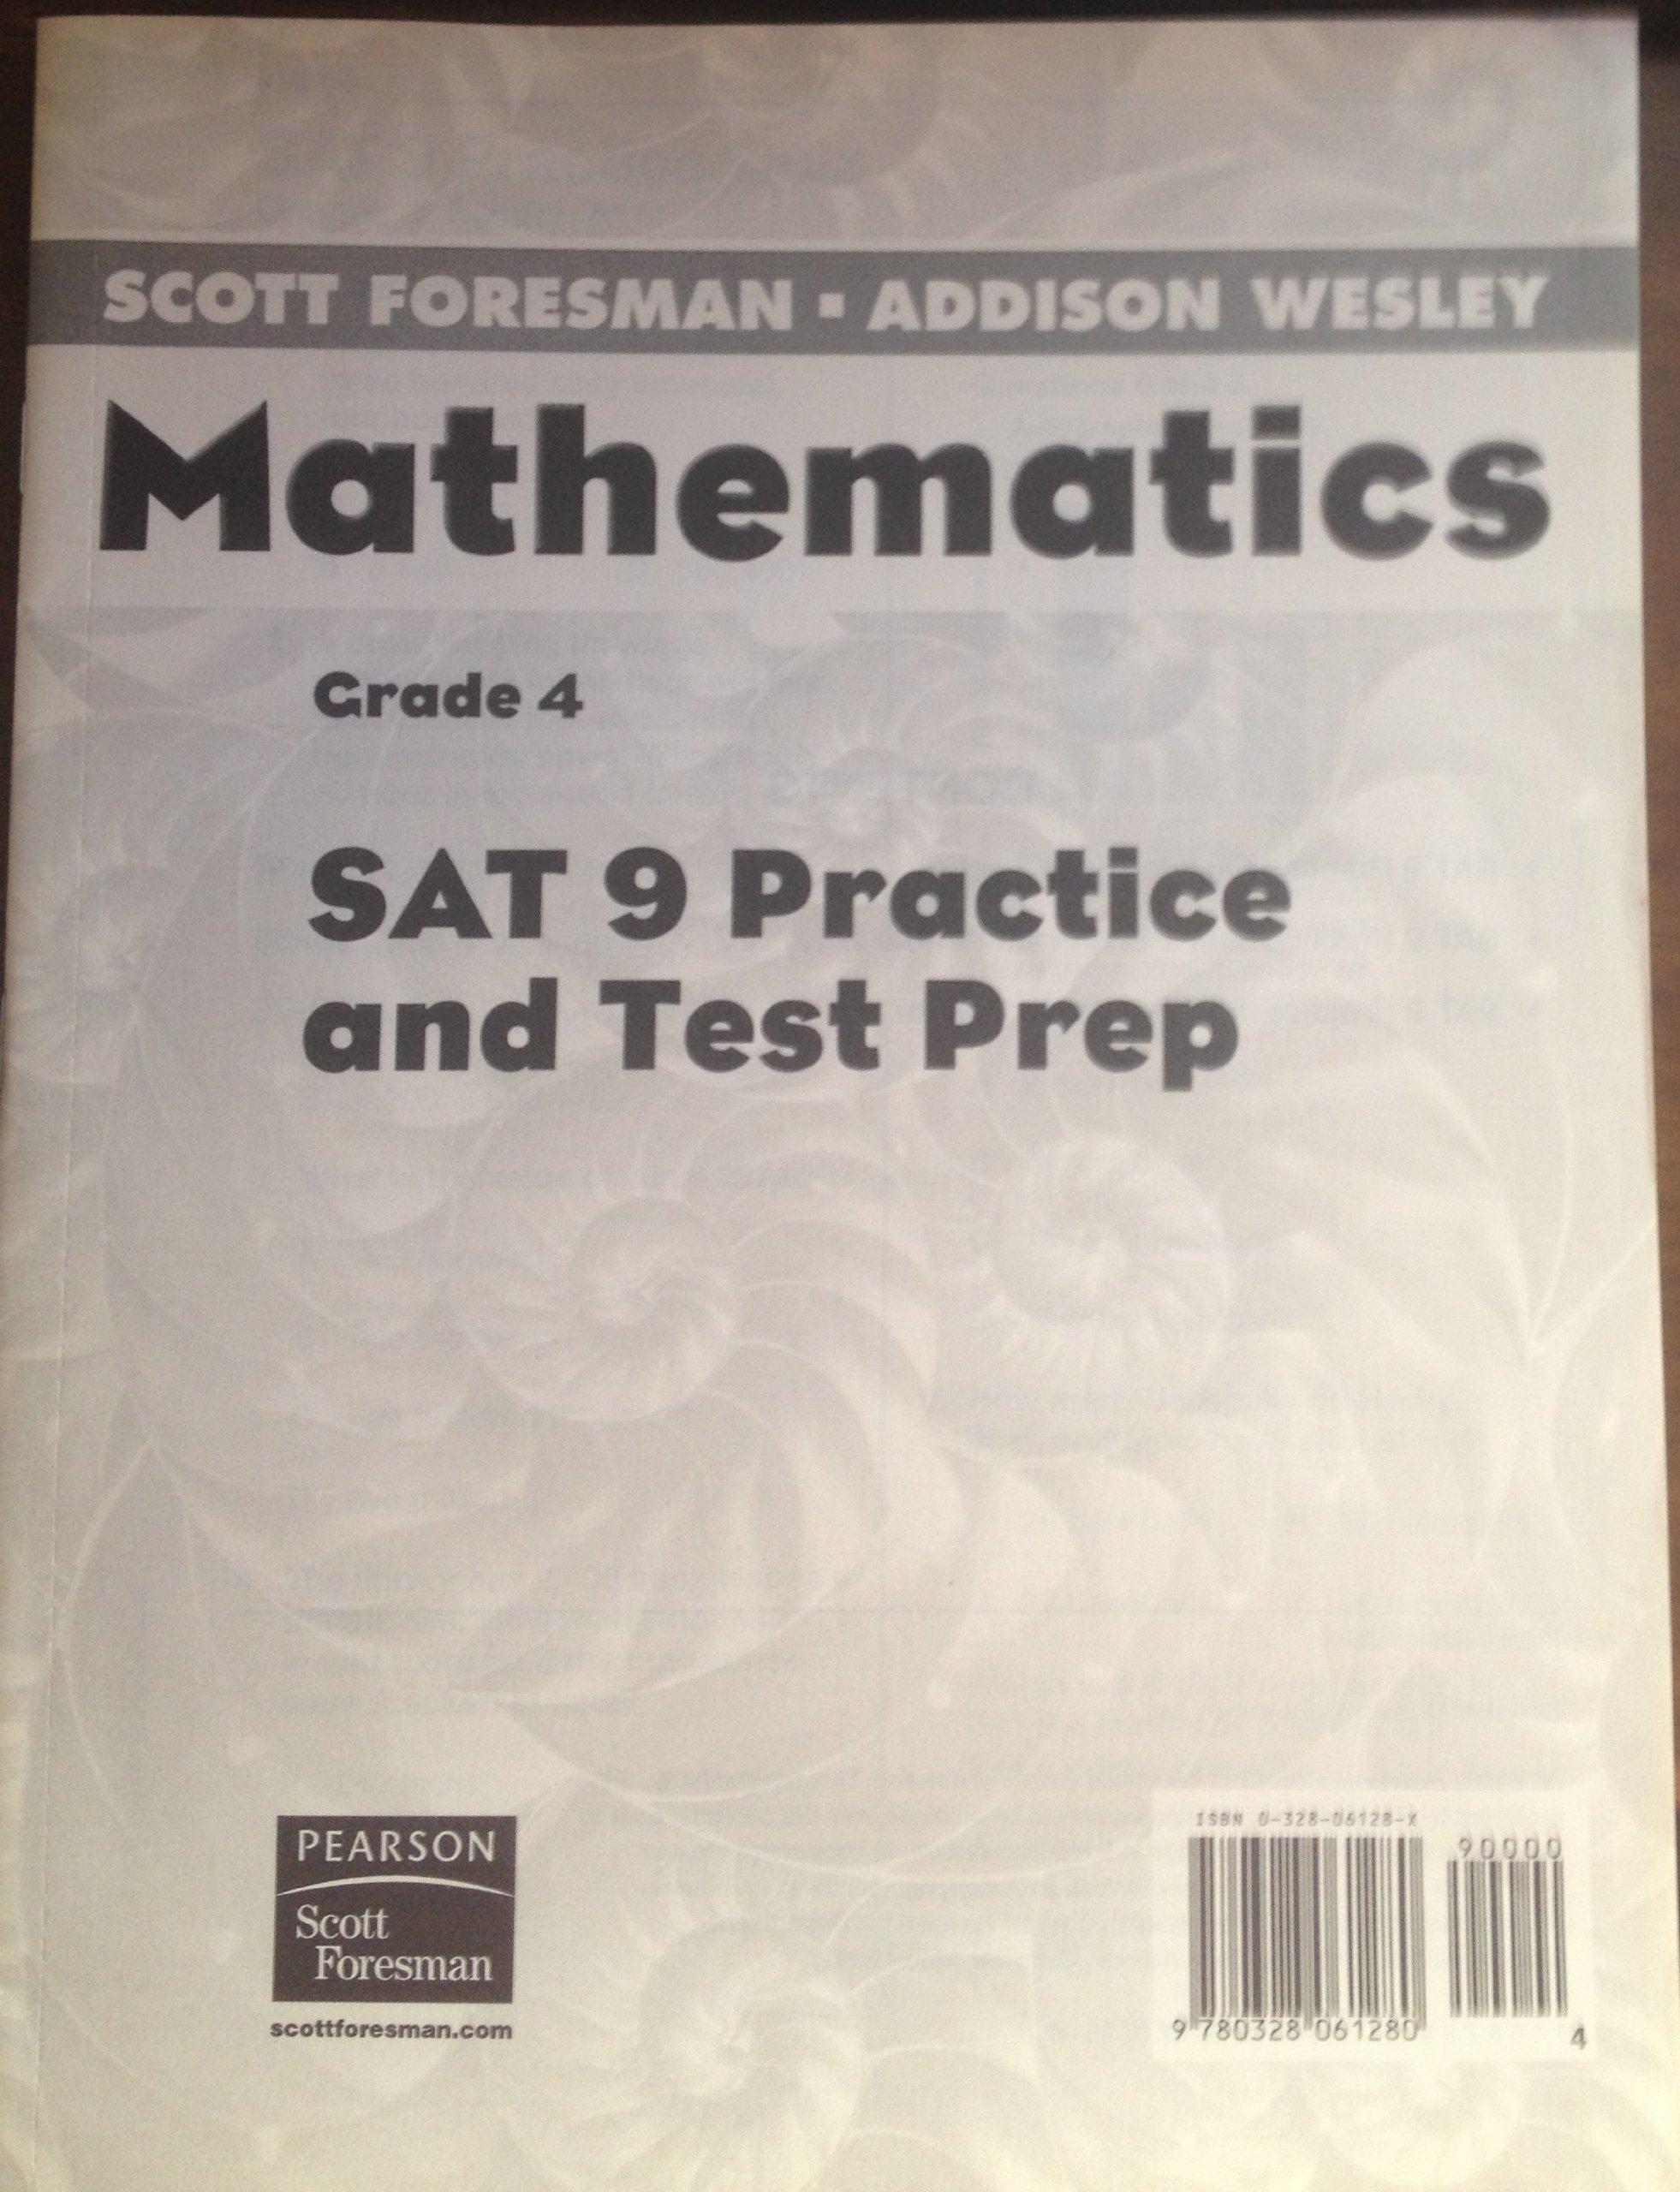 Scott Foresman - Addison Wesley Mathematics: Grade 4: SAT 9 Practice and  Test Prep: Scott Foresman: 9780328061280: Amazon.com: Books